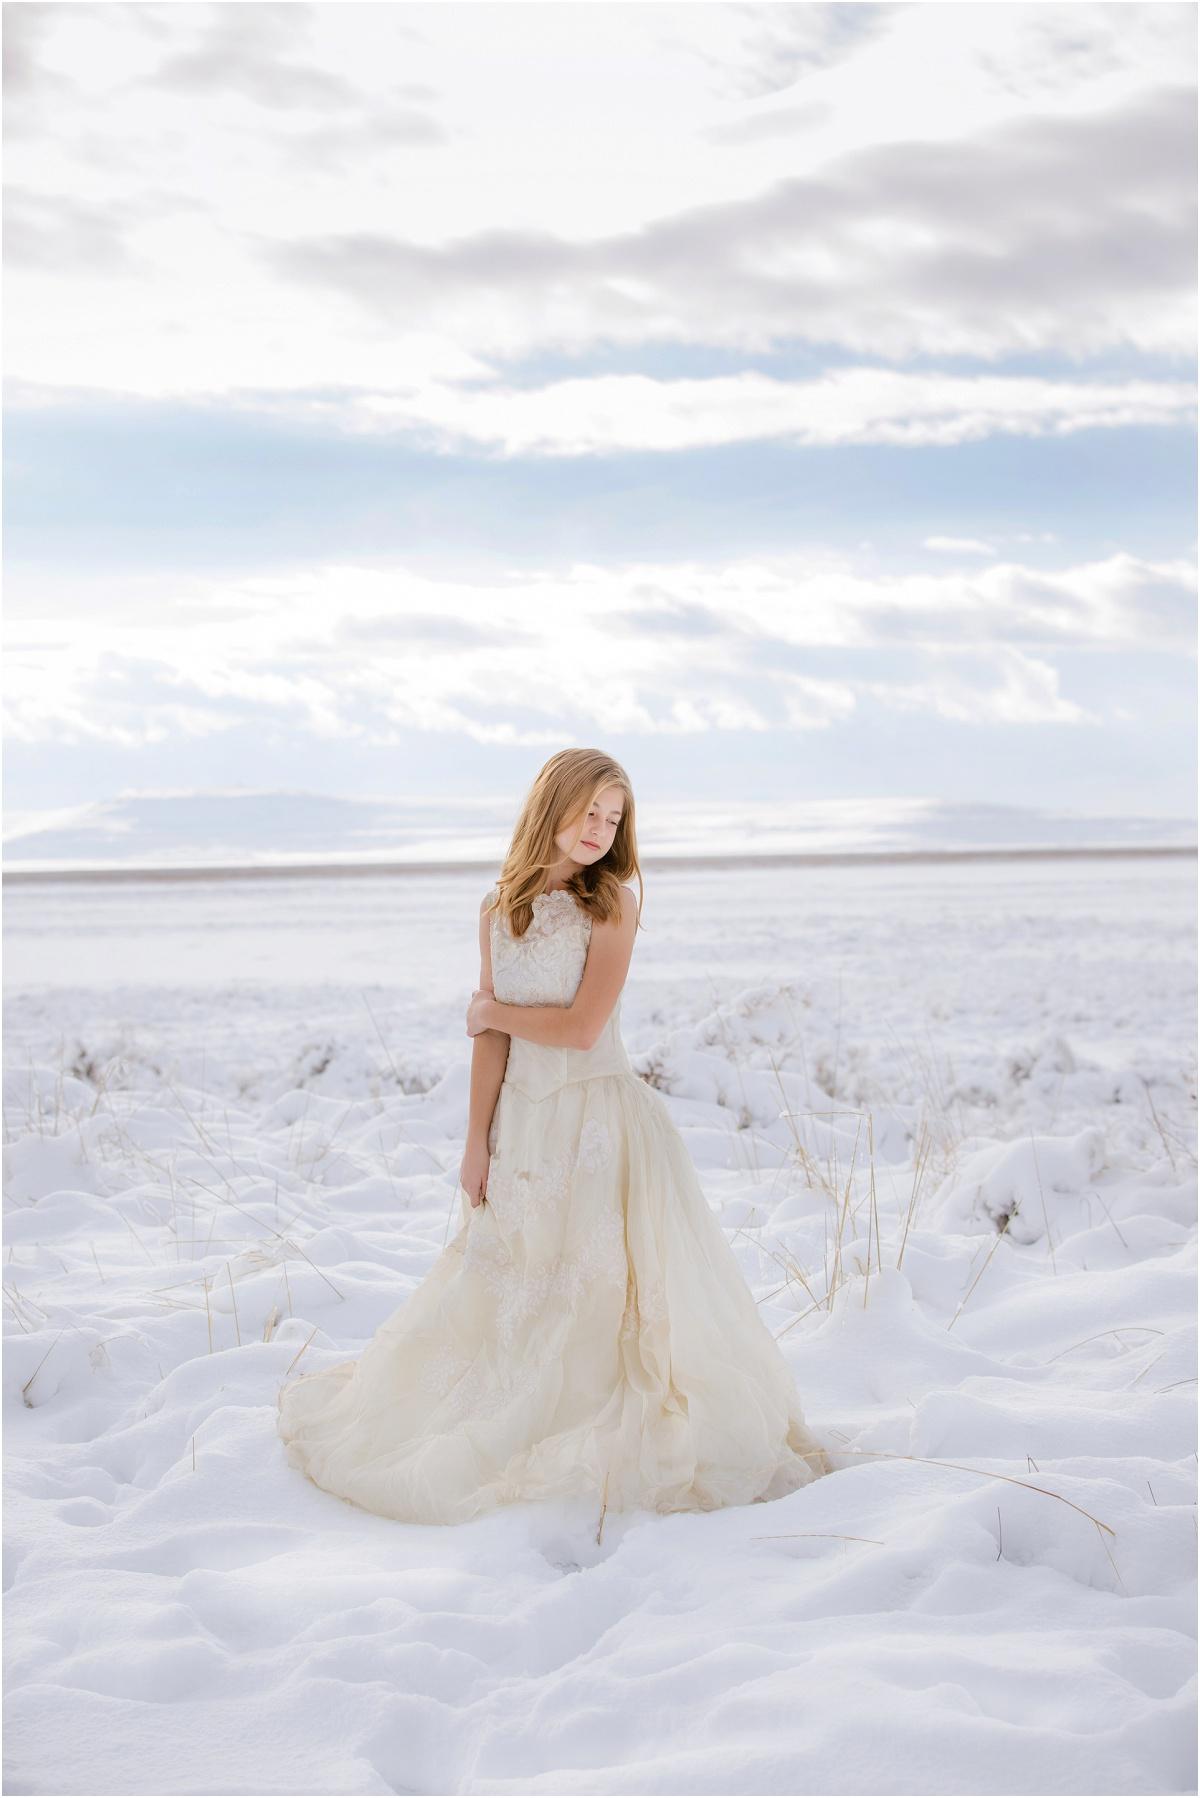 Snow Princess Winter Shoot Terra Cooper Photography_5033.jpg